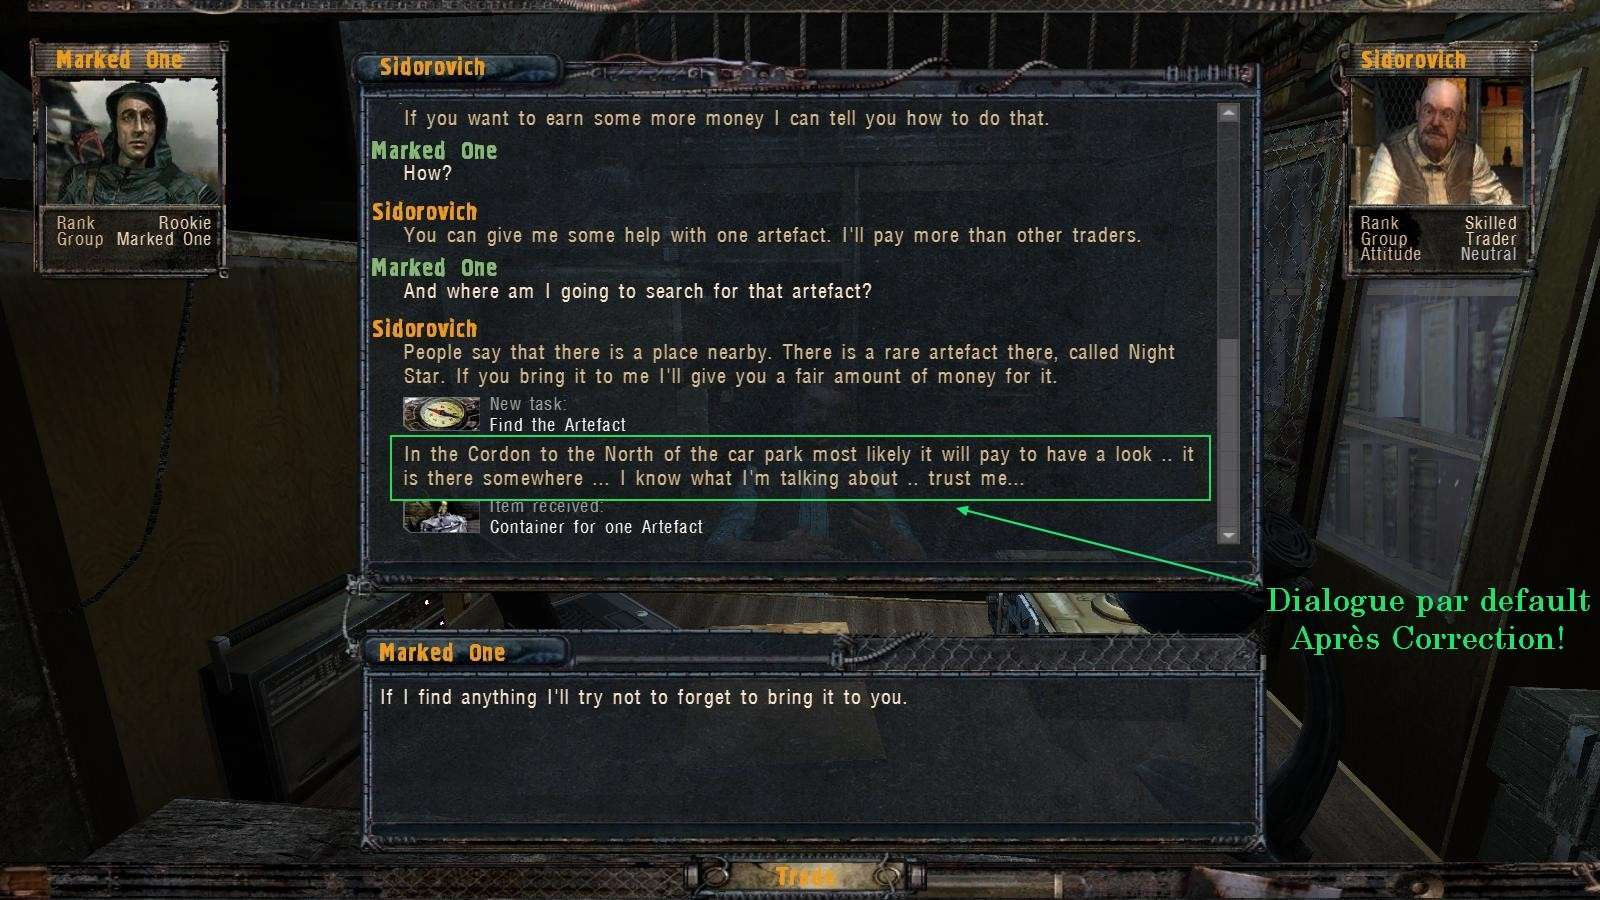 DMX mod 1.3.4 - Traduction Anglaise maintenant Disponible!! - Page 7 Ss_bou25